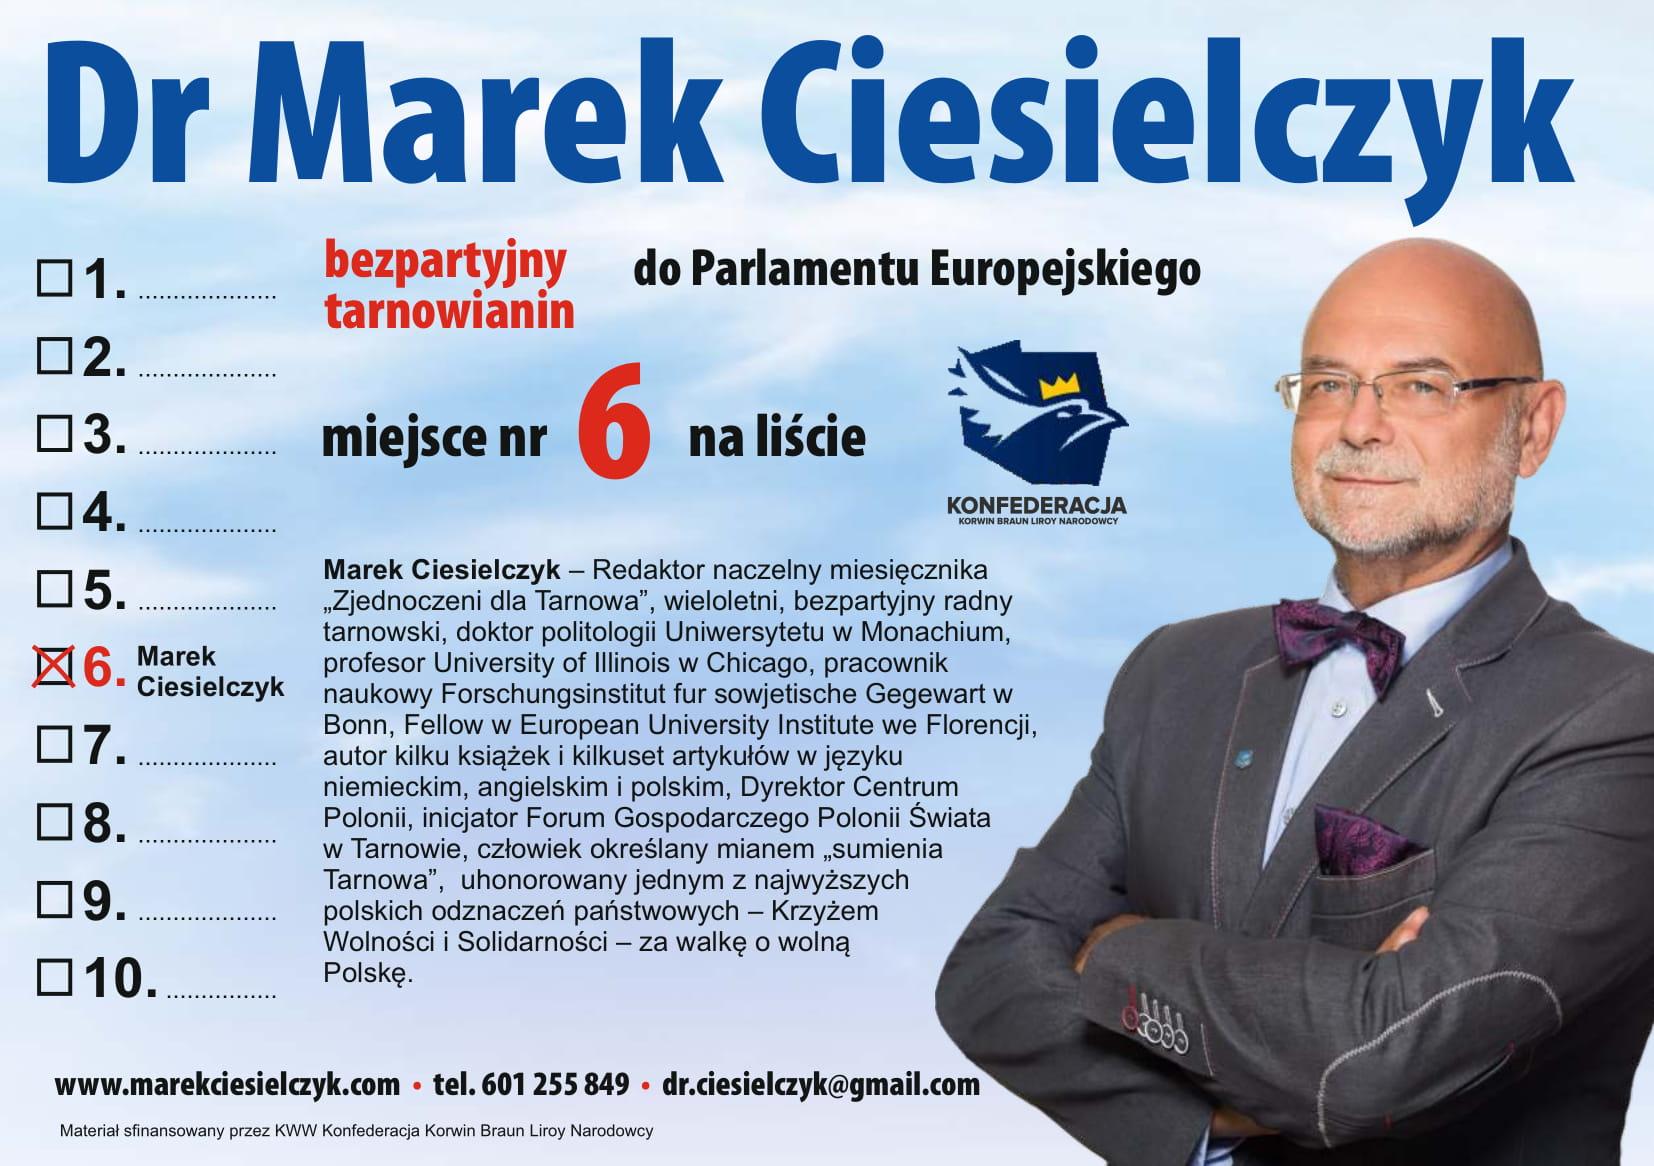 dr Ciesielczyk do PE ulotka jpg 1jpg